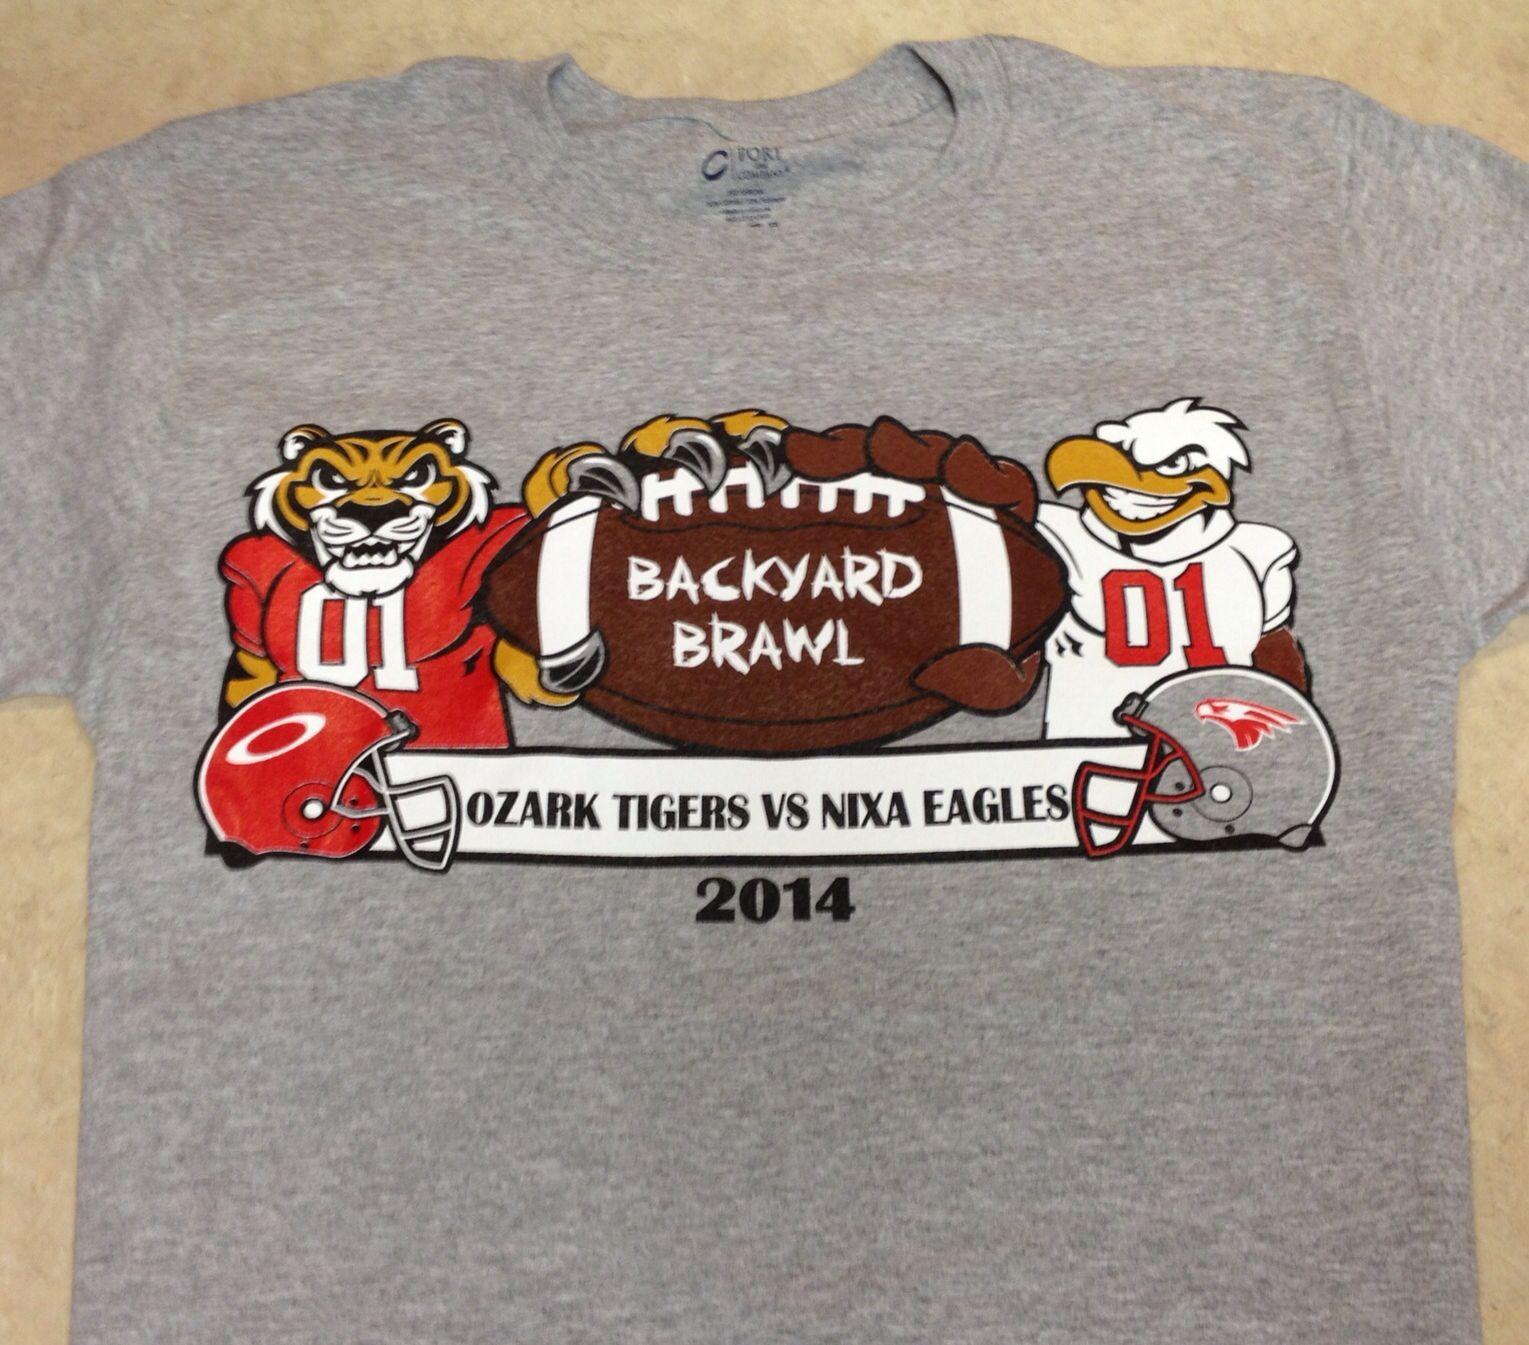 ozark tigers vs nixa eagles backyard brawl 2014 football shirt